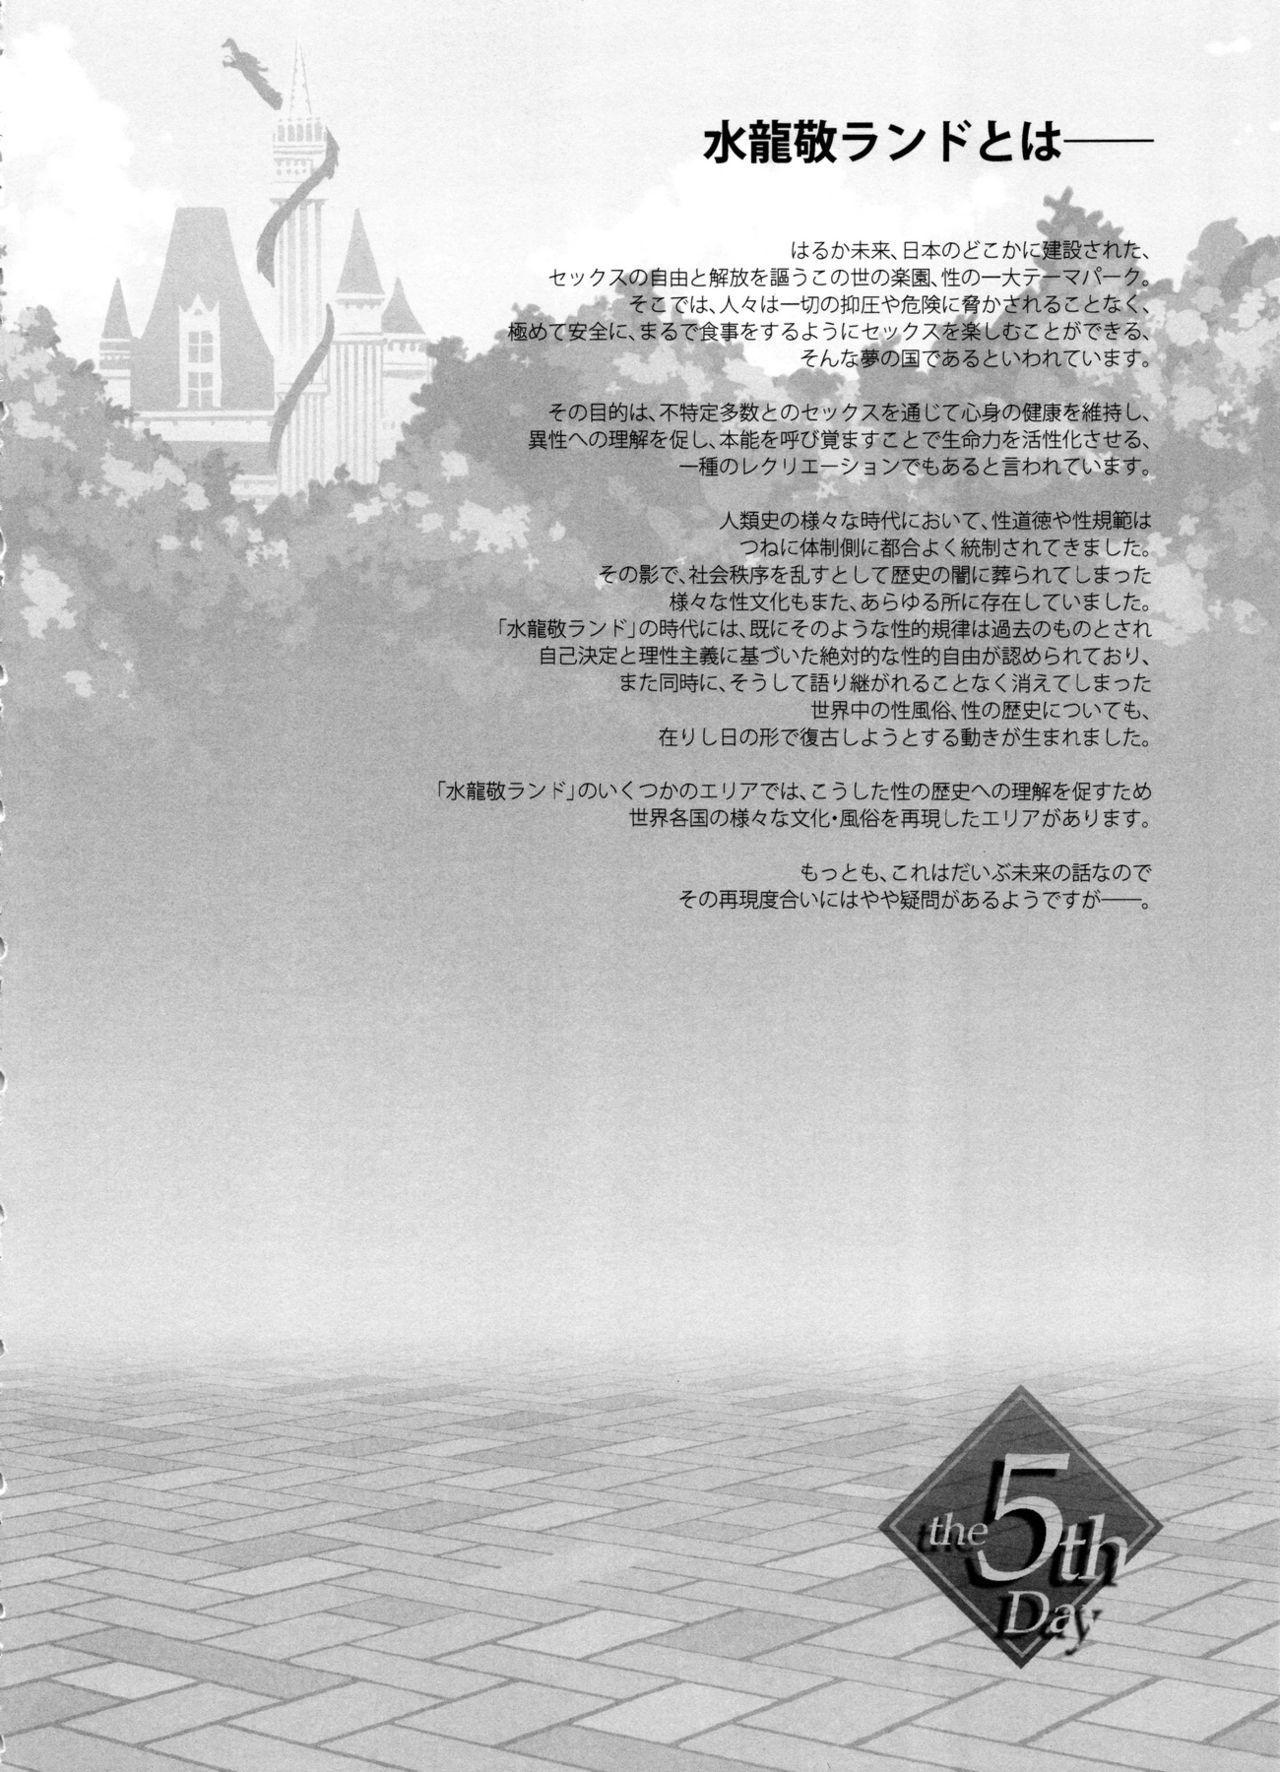 Oideyo! Mizuryu Kei Land the 5th Day 4